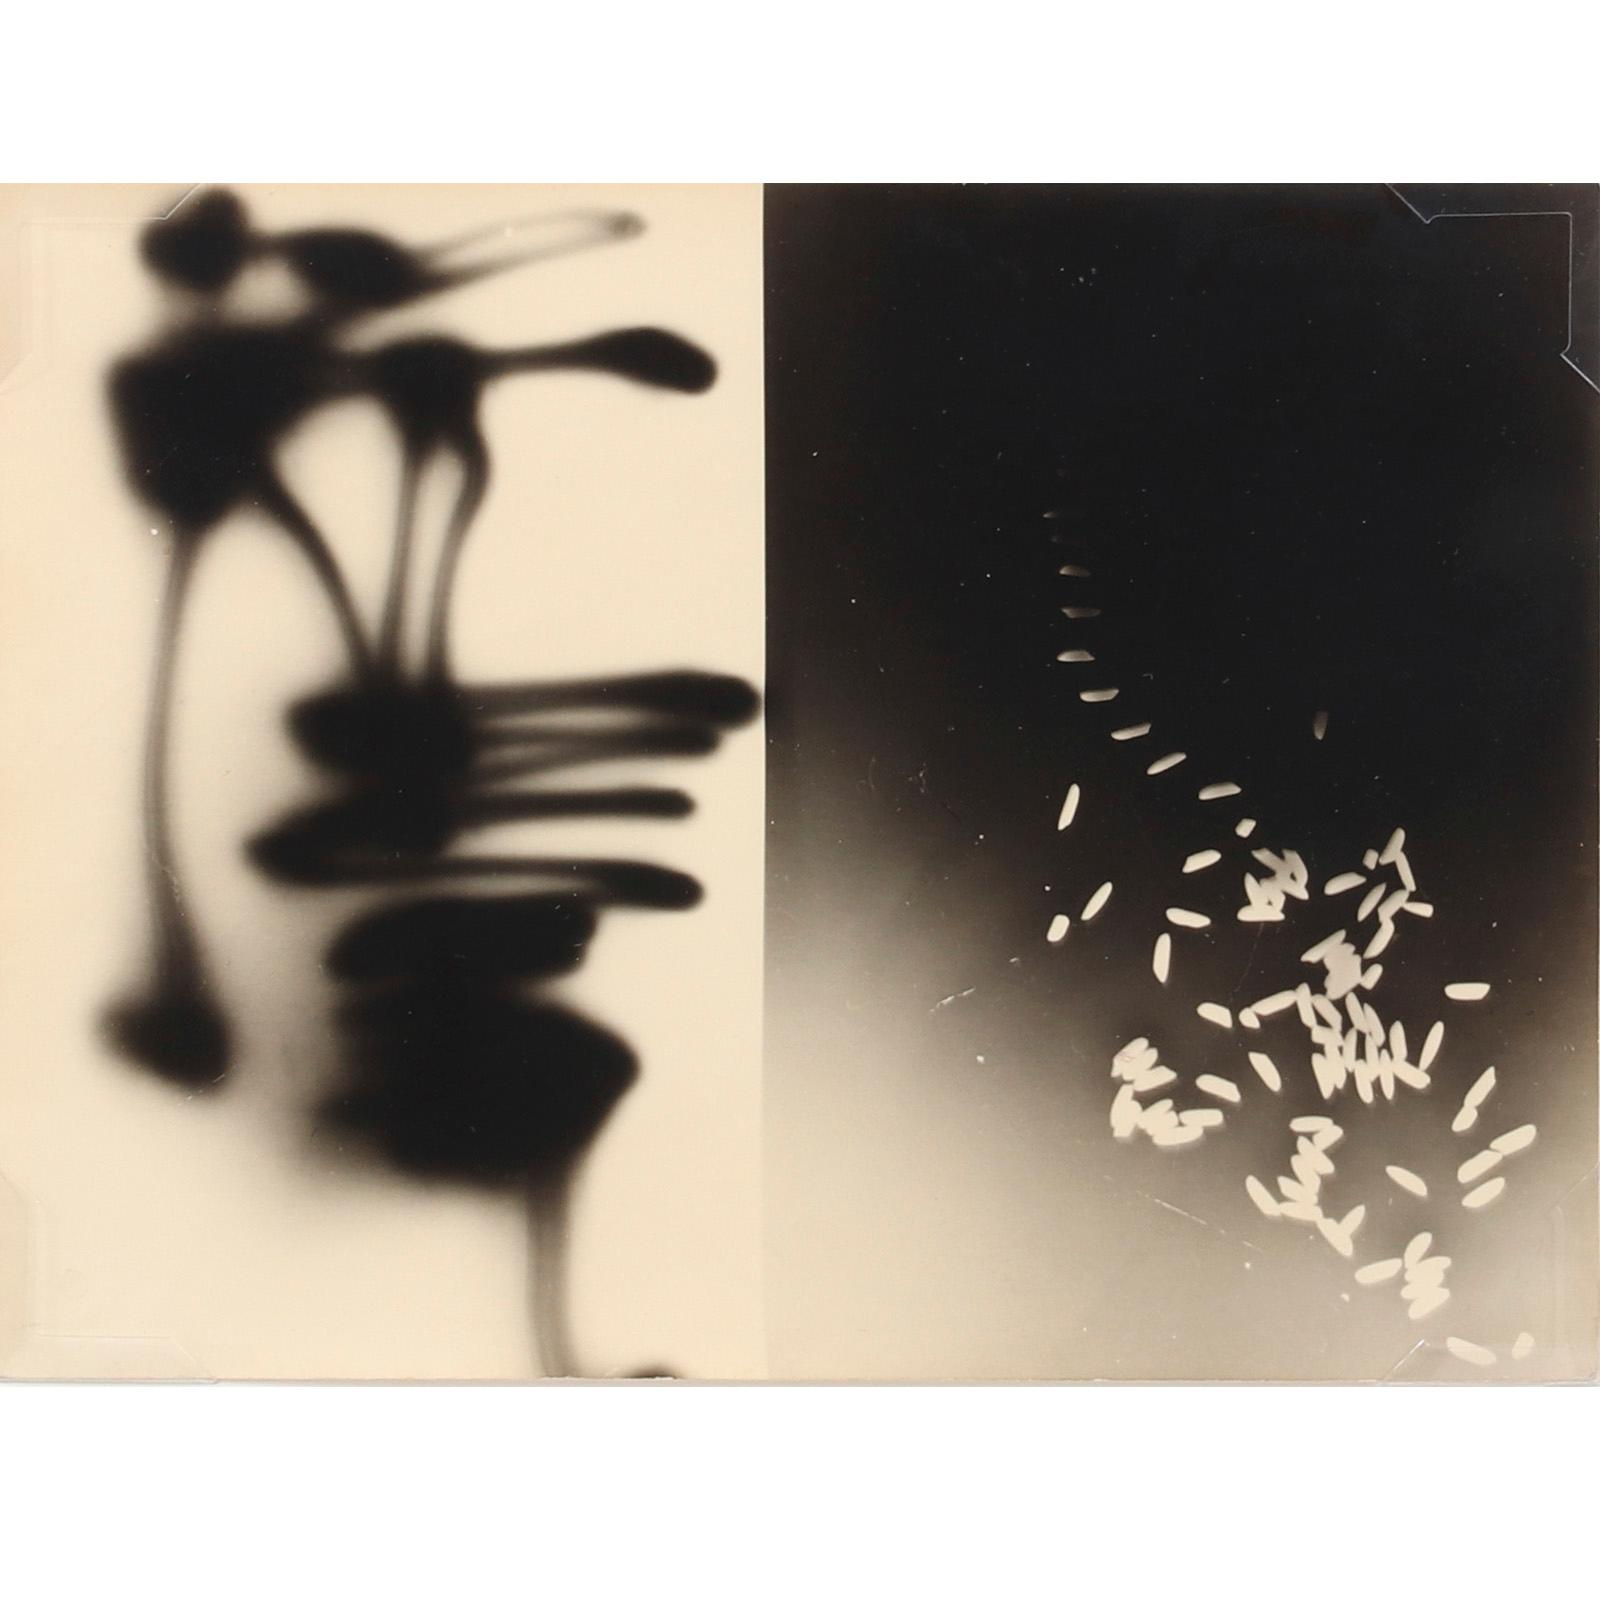 "Gyorgy Kepes, (American, 1906-2001), Kinetic Static Photogram, 1949, silver gelatin photogram, 7"" x 9 1/4"" (sight), 11 1/4"" x 13 1/2"" (frame)."